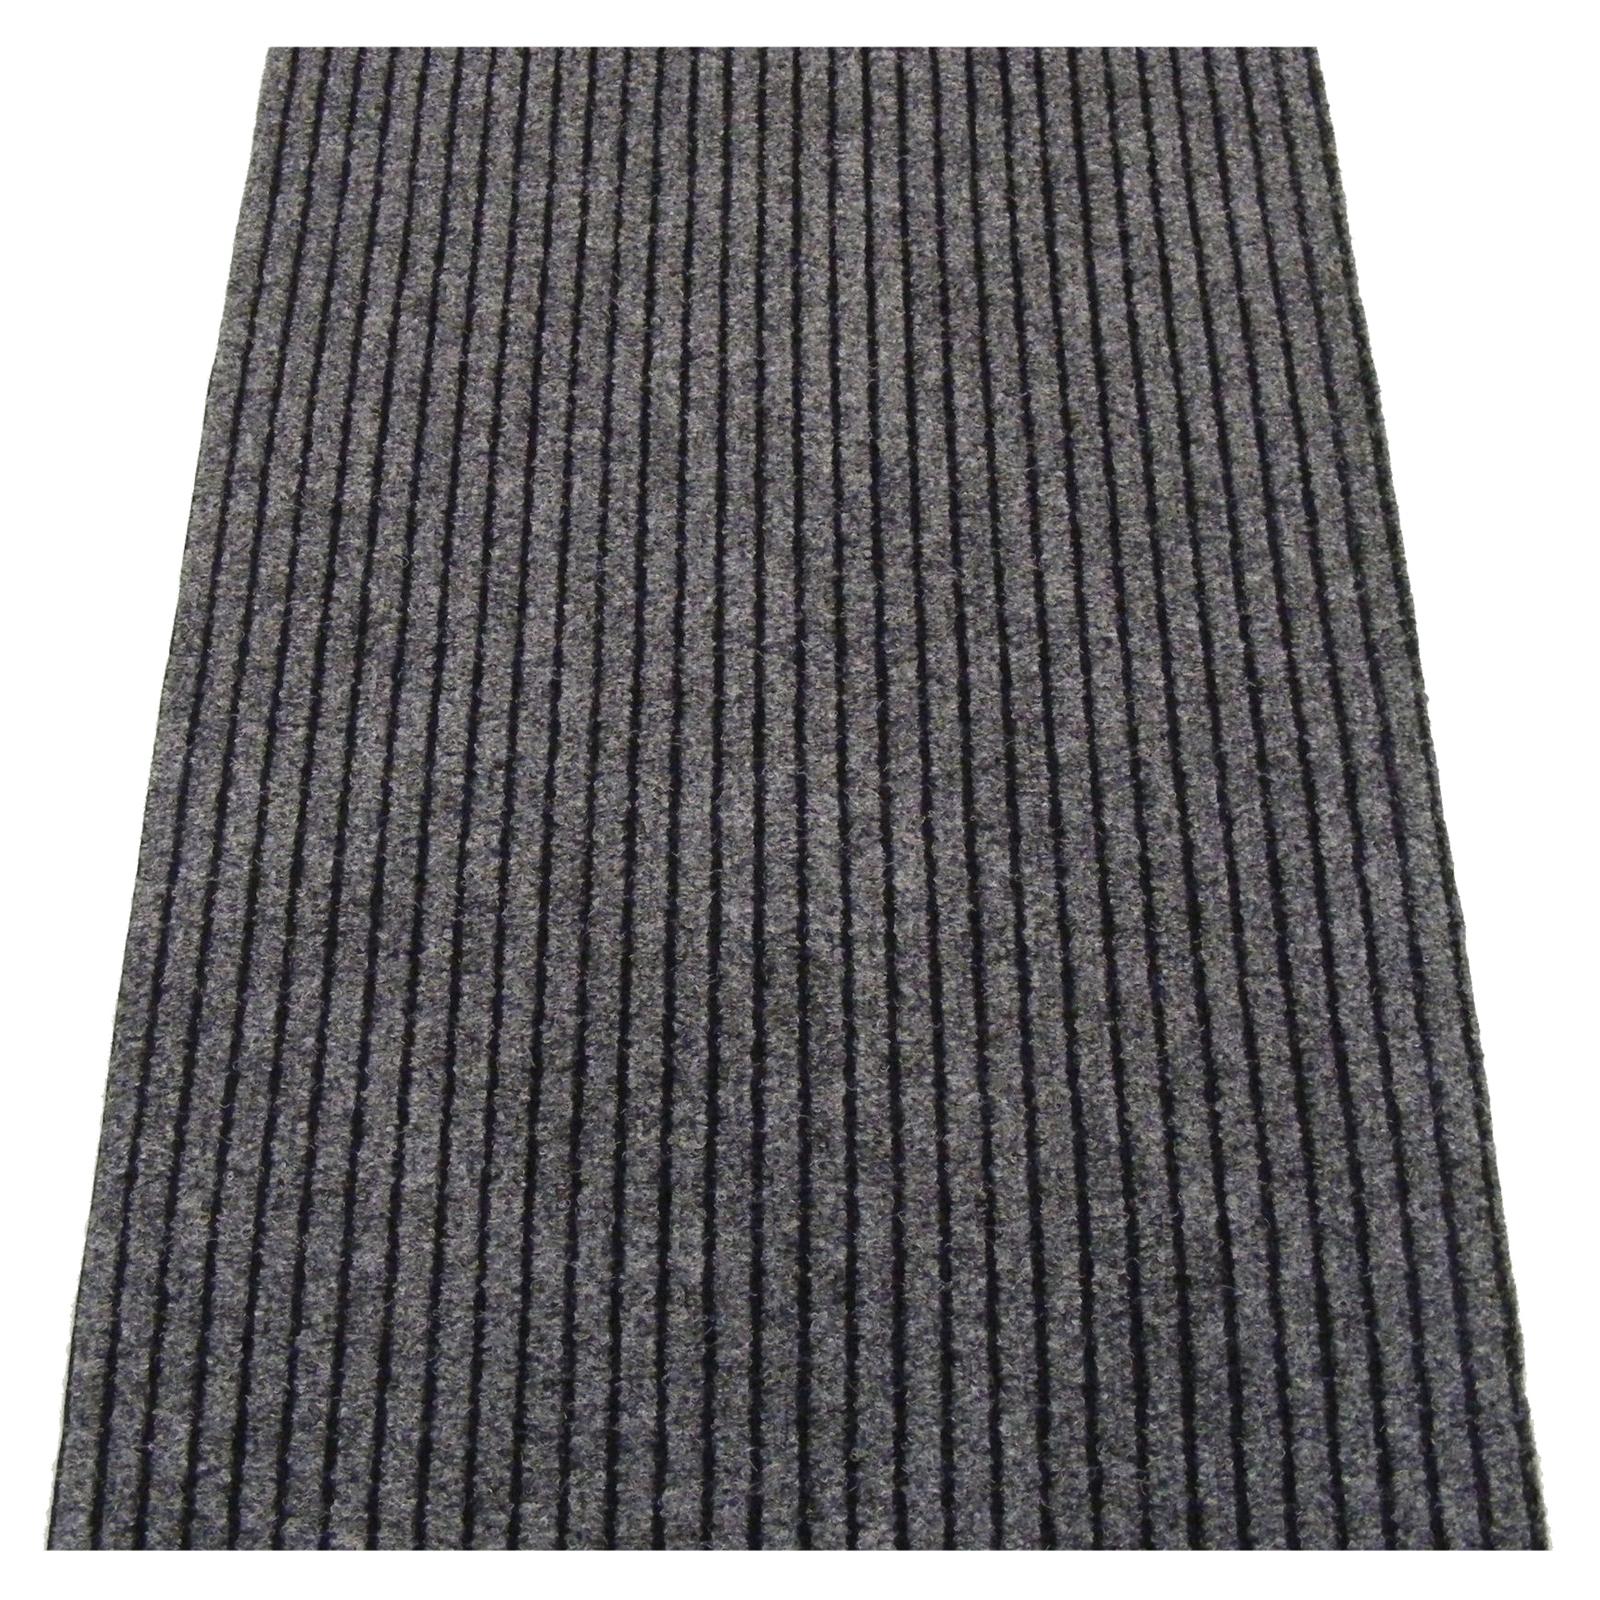 Ideal DIY Grey Dallas Wide Ribbed Carpet Runner - Linear Metre